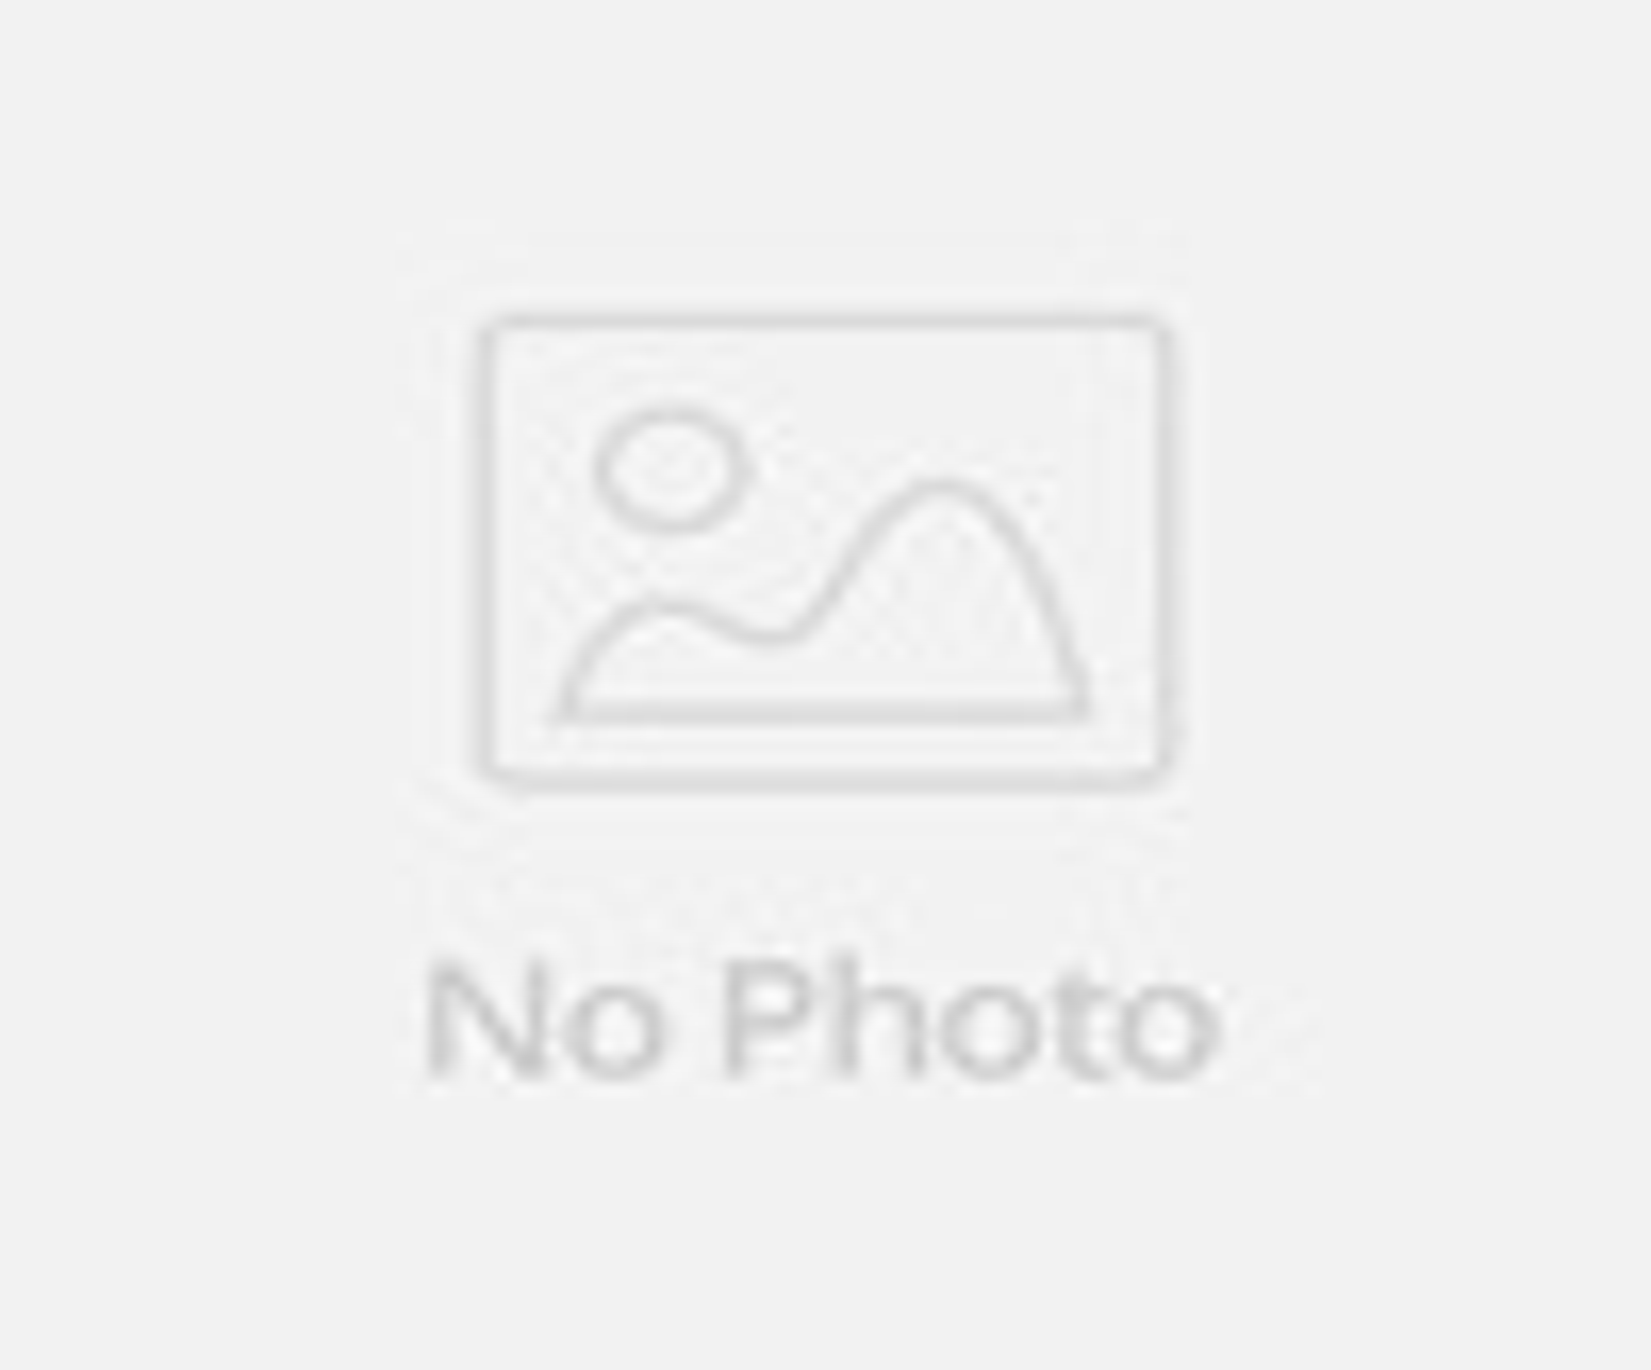 Paddle wheel turbine device - Hesting, Daniel O.